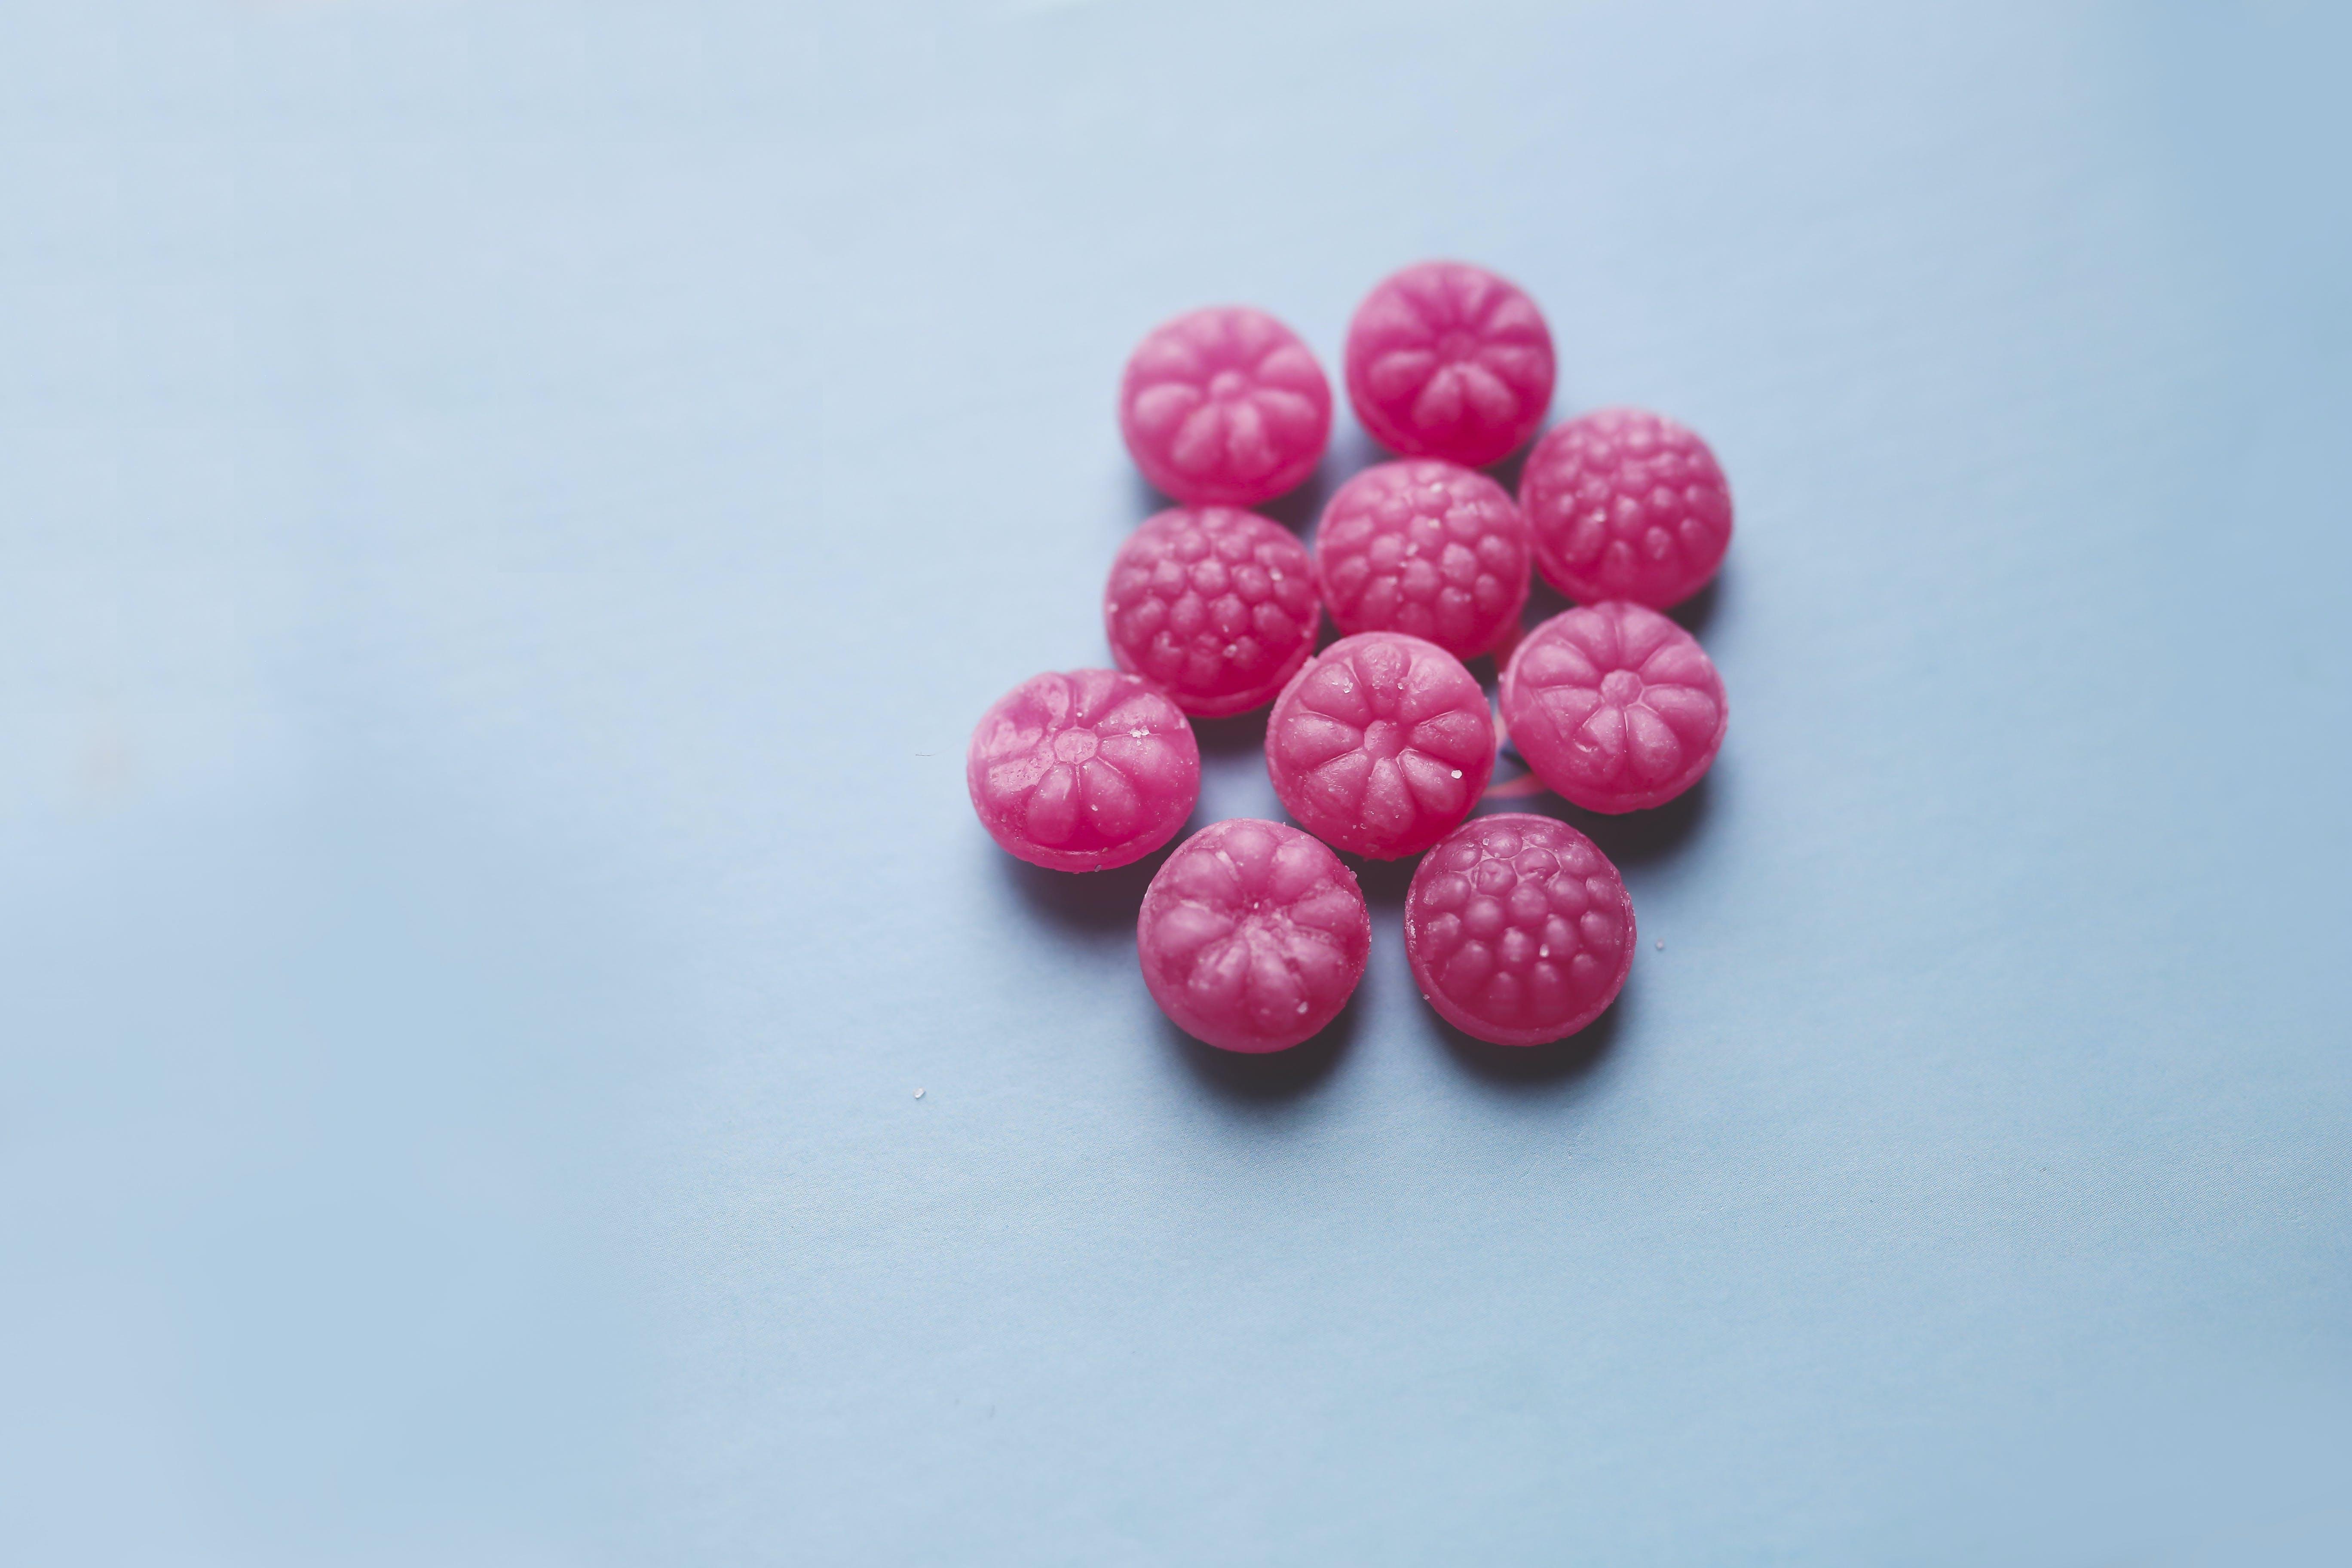 Sweet pink candies